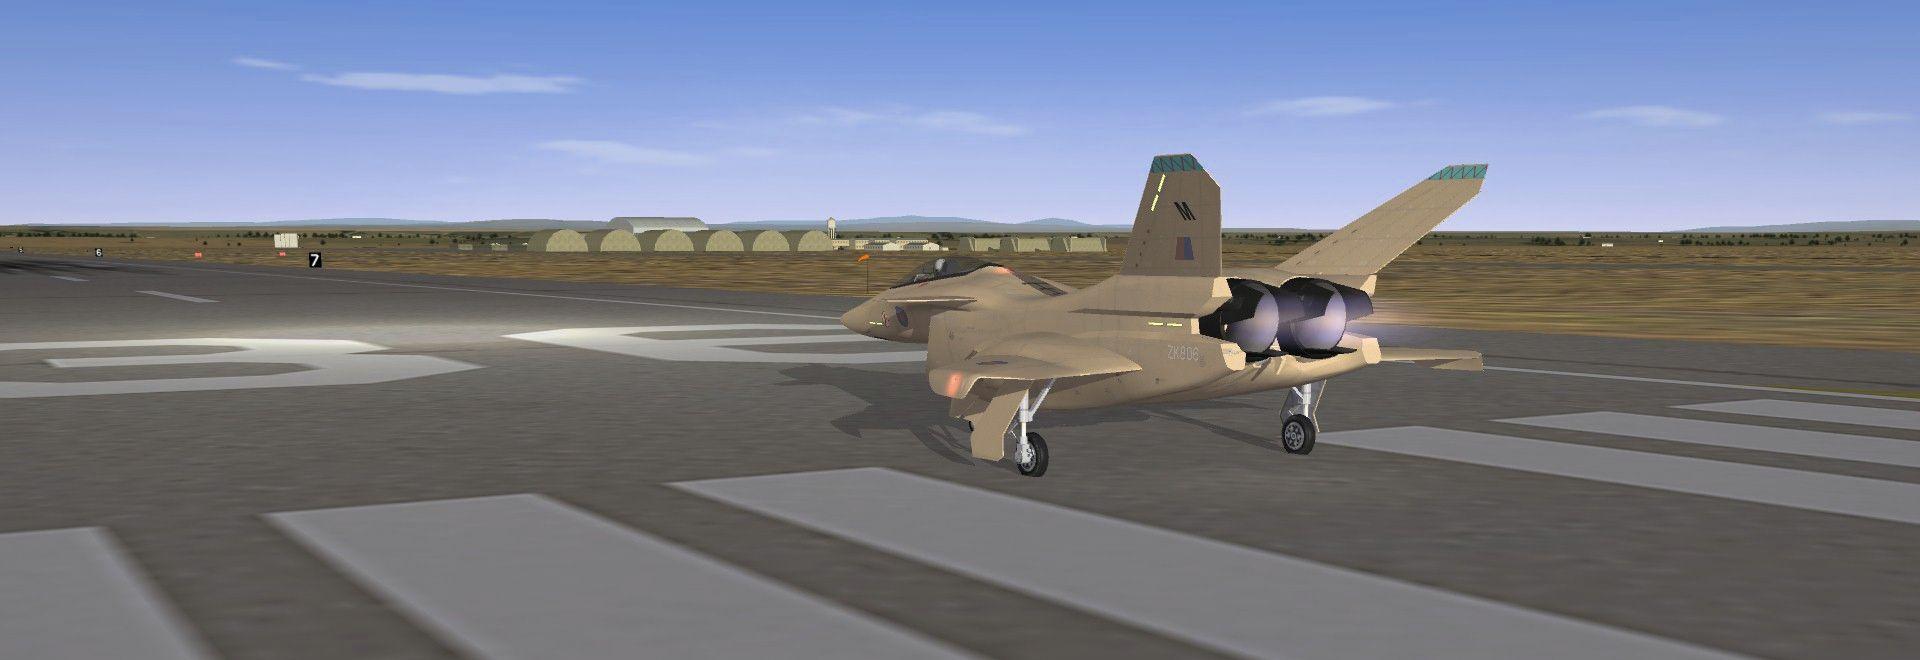 RAFFA-27C01.jpg